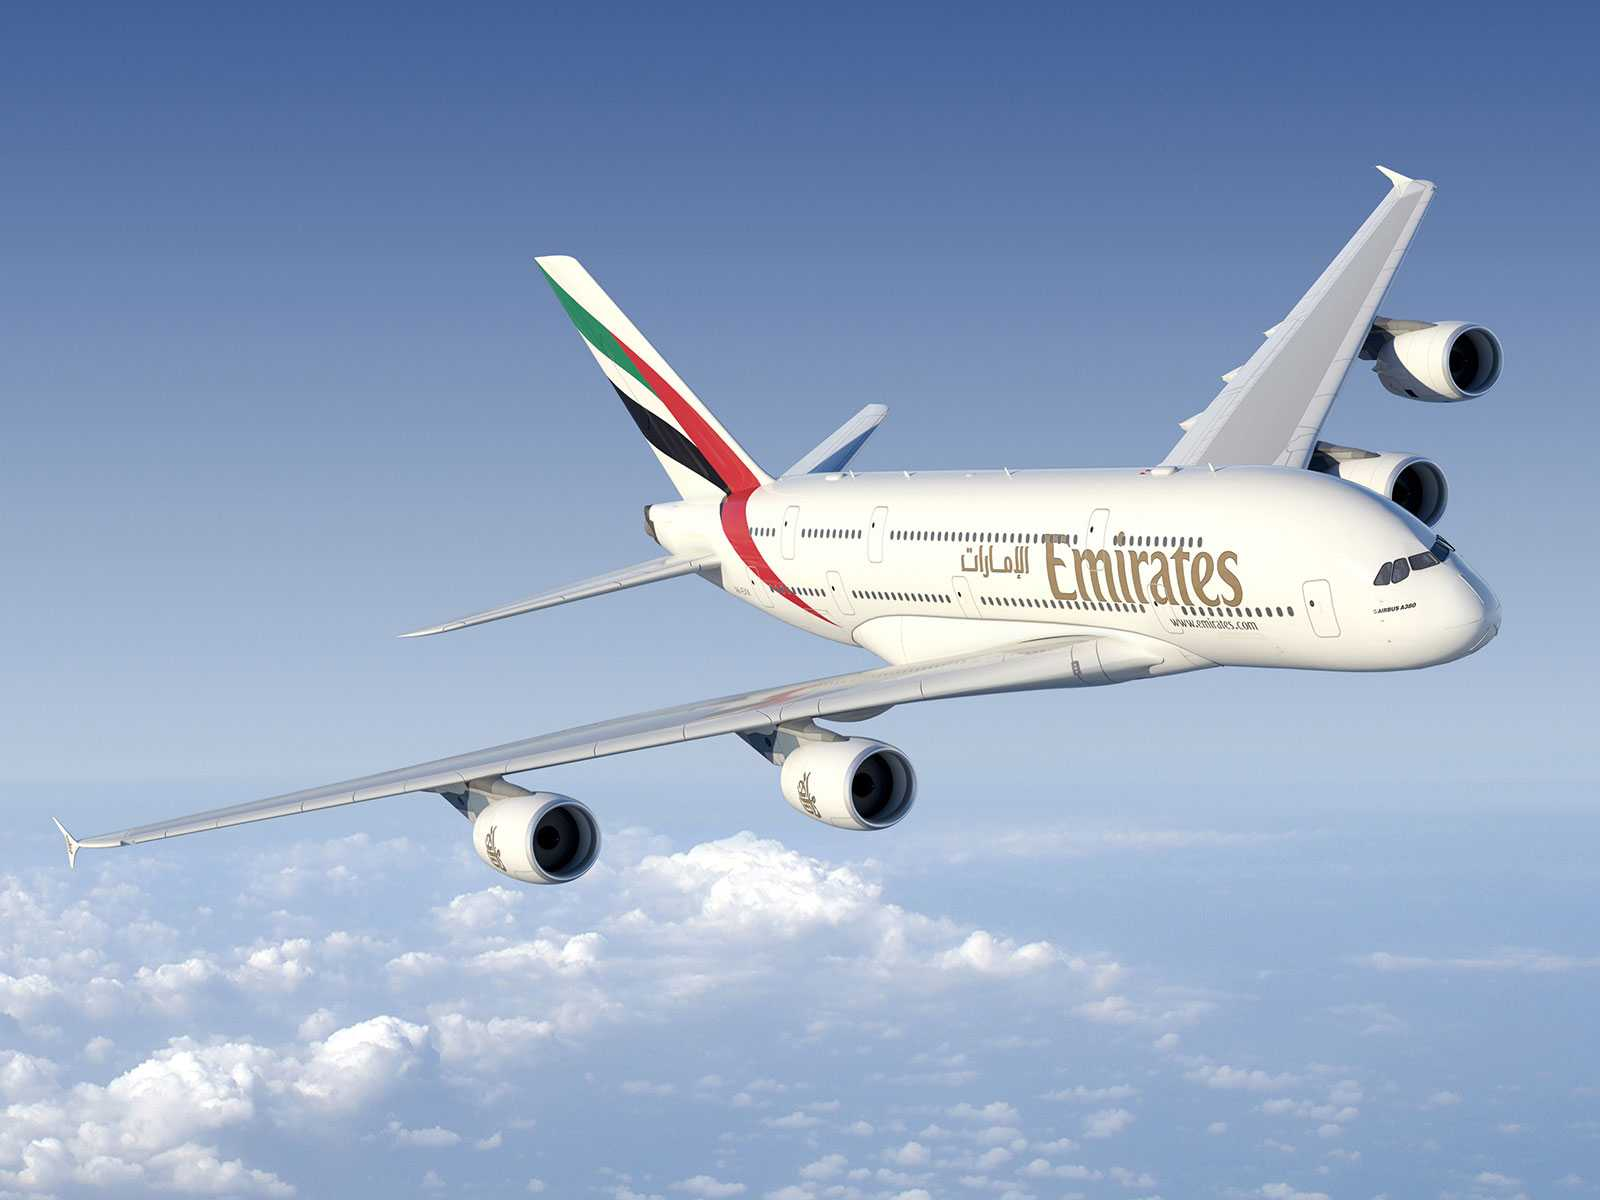 Photo Credit: Emirates